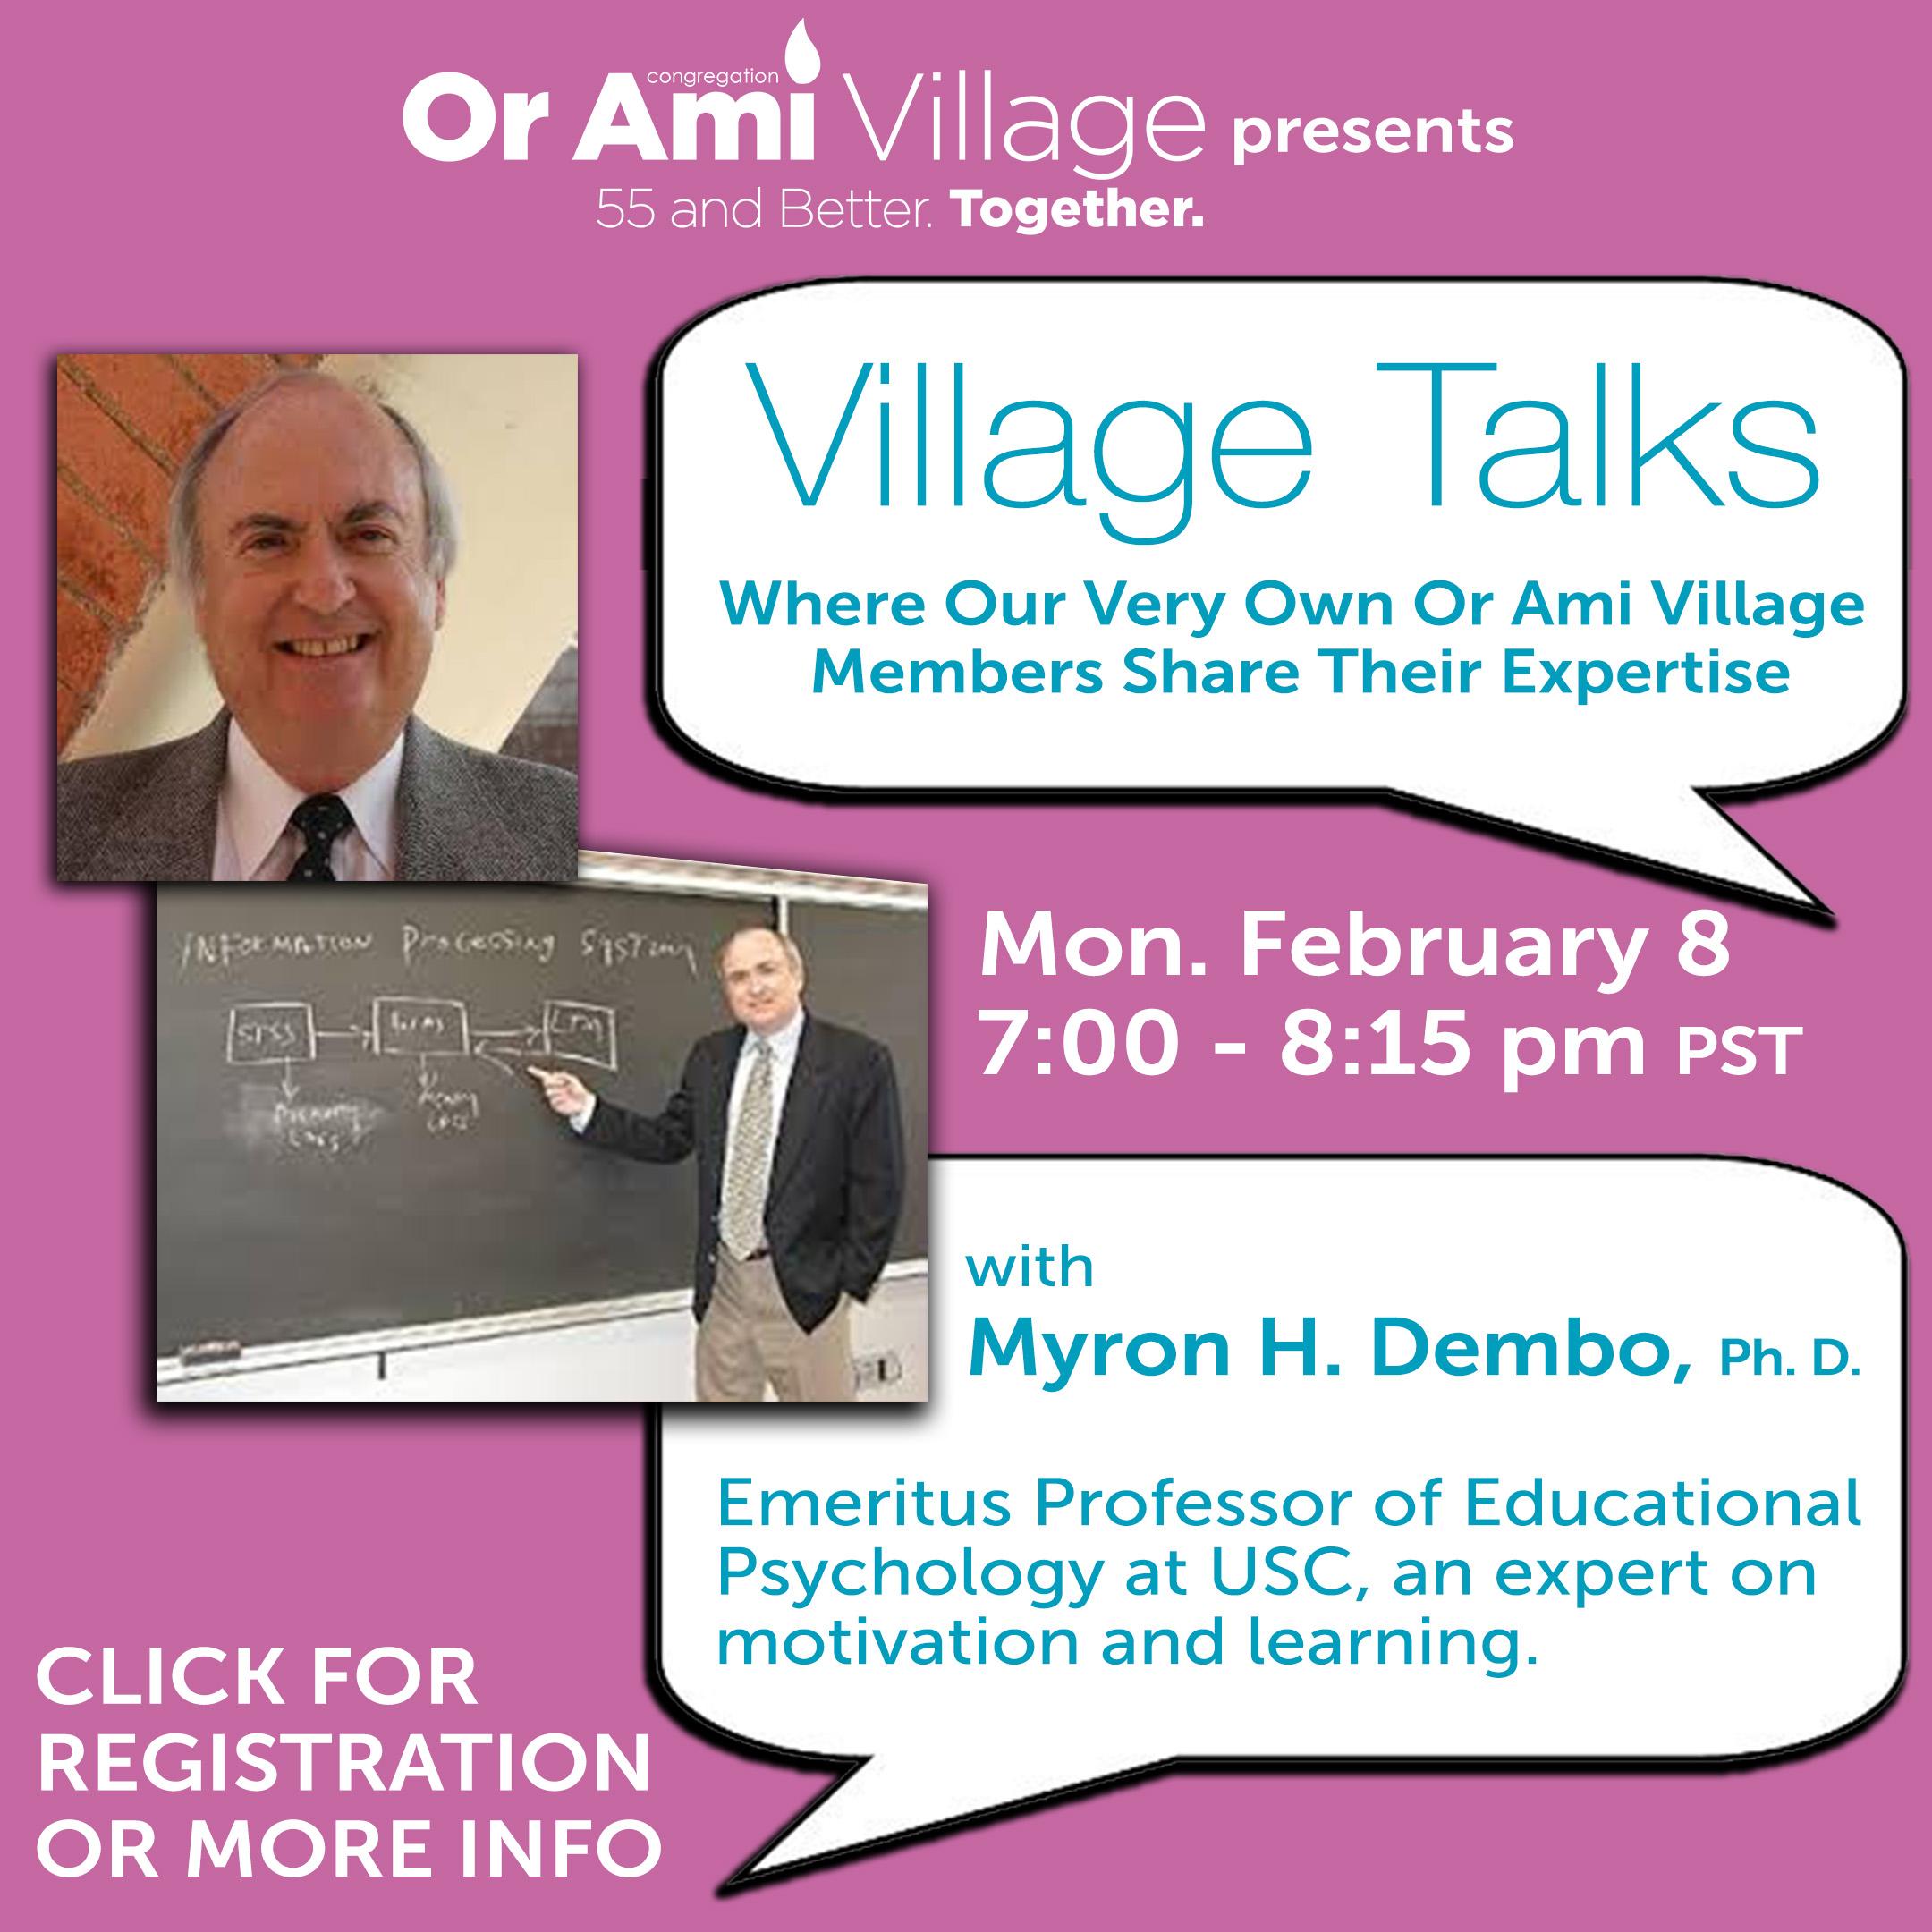 myron village talk with CLICK